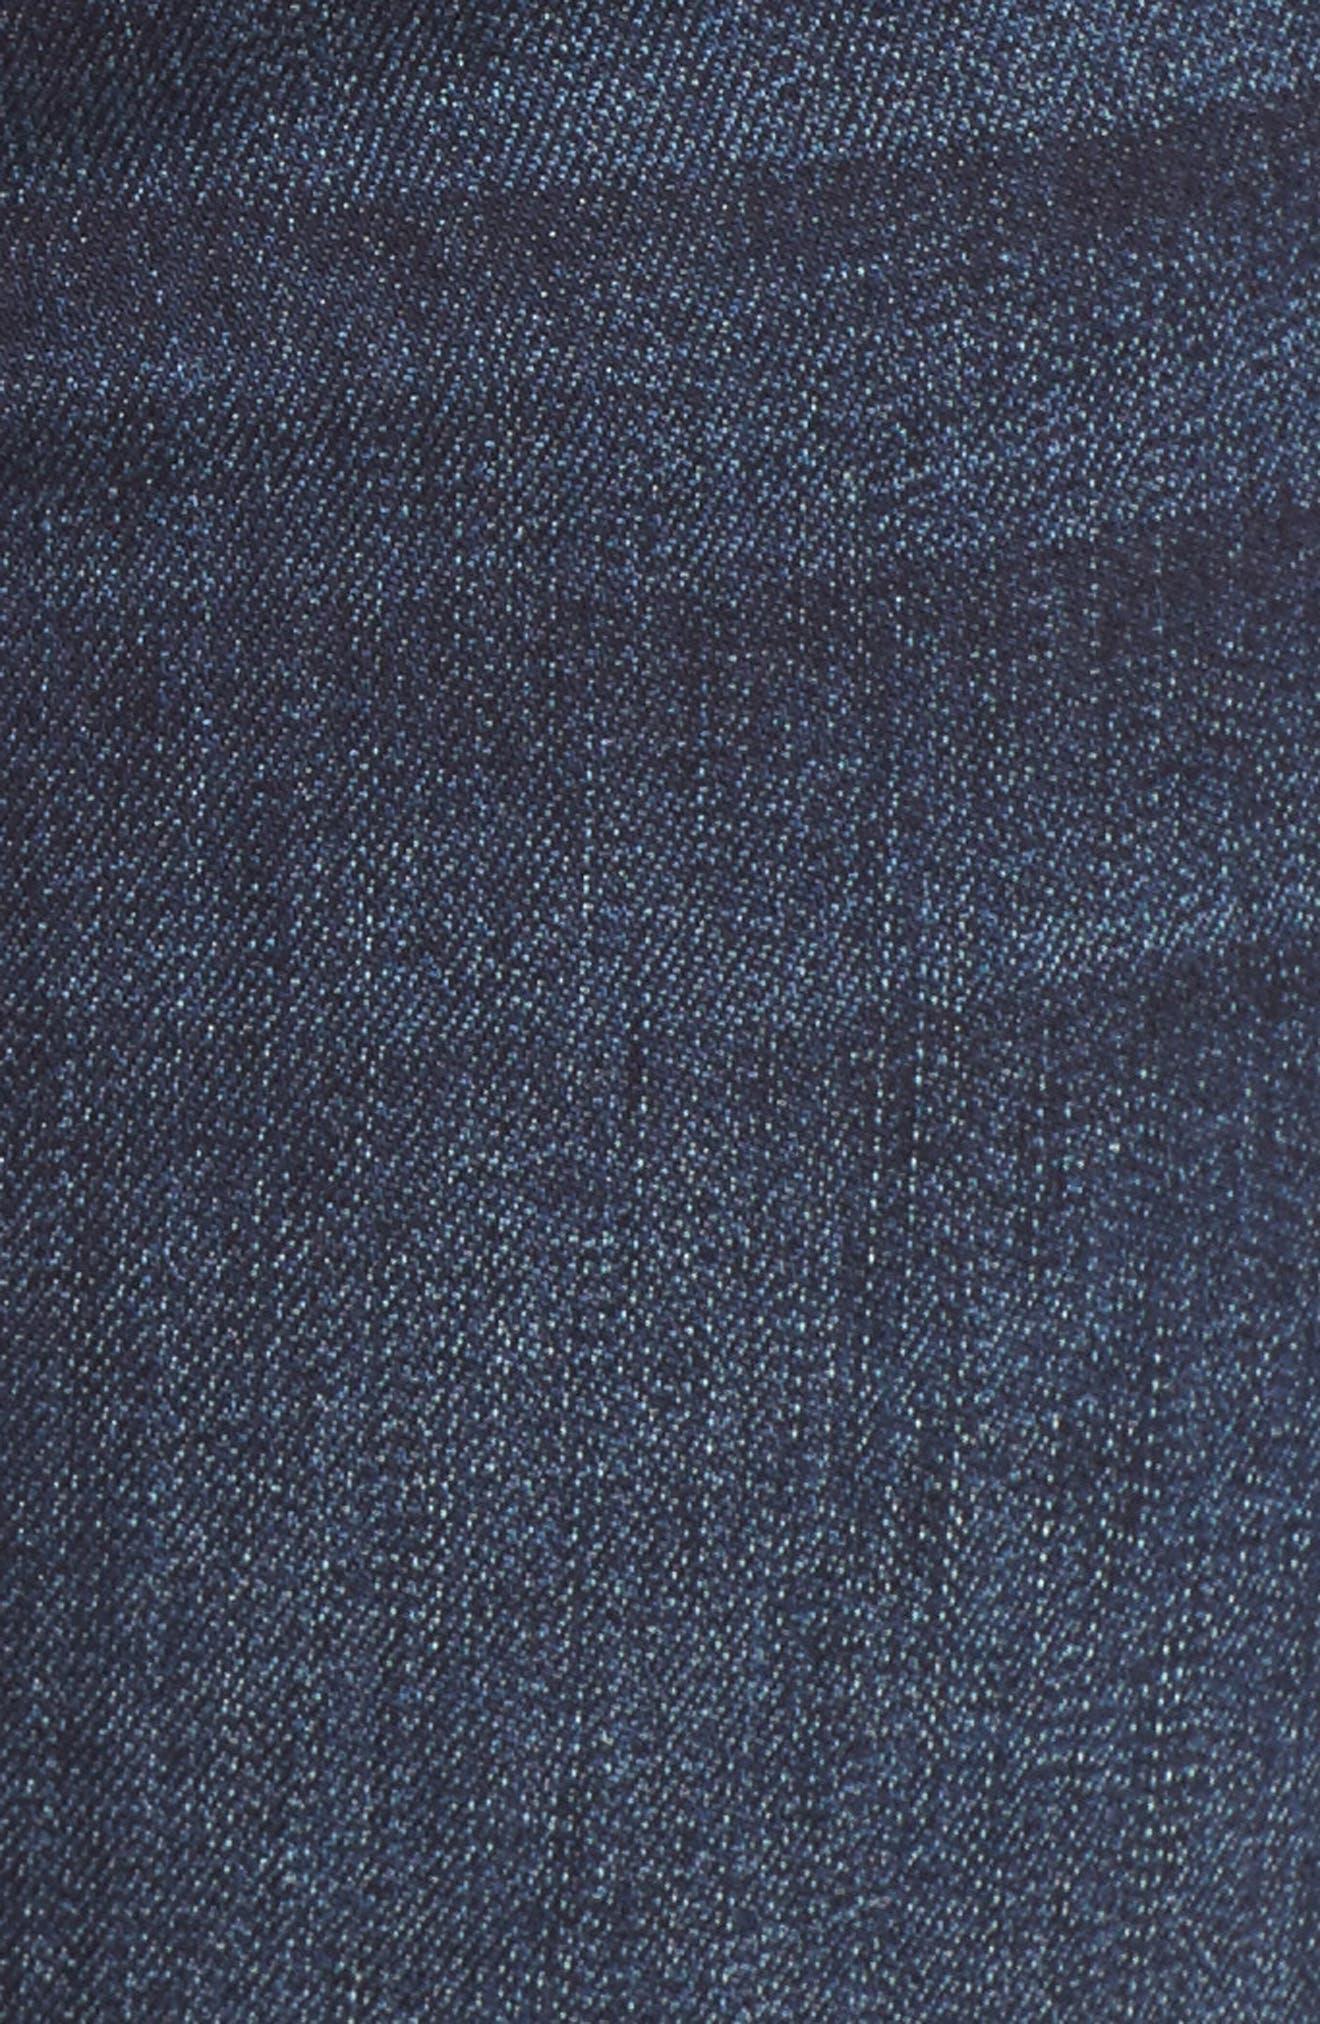 Corine Denim Shorts,                             Alternate thumbnail 6, color,                             401